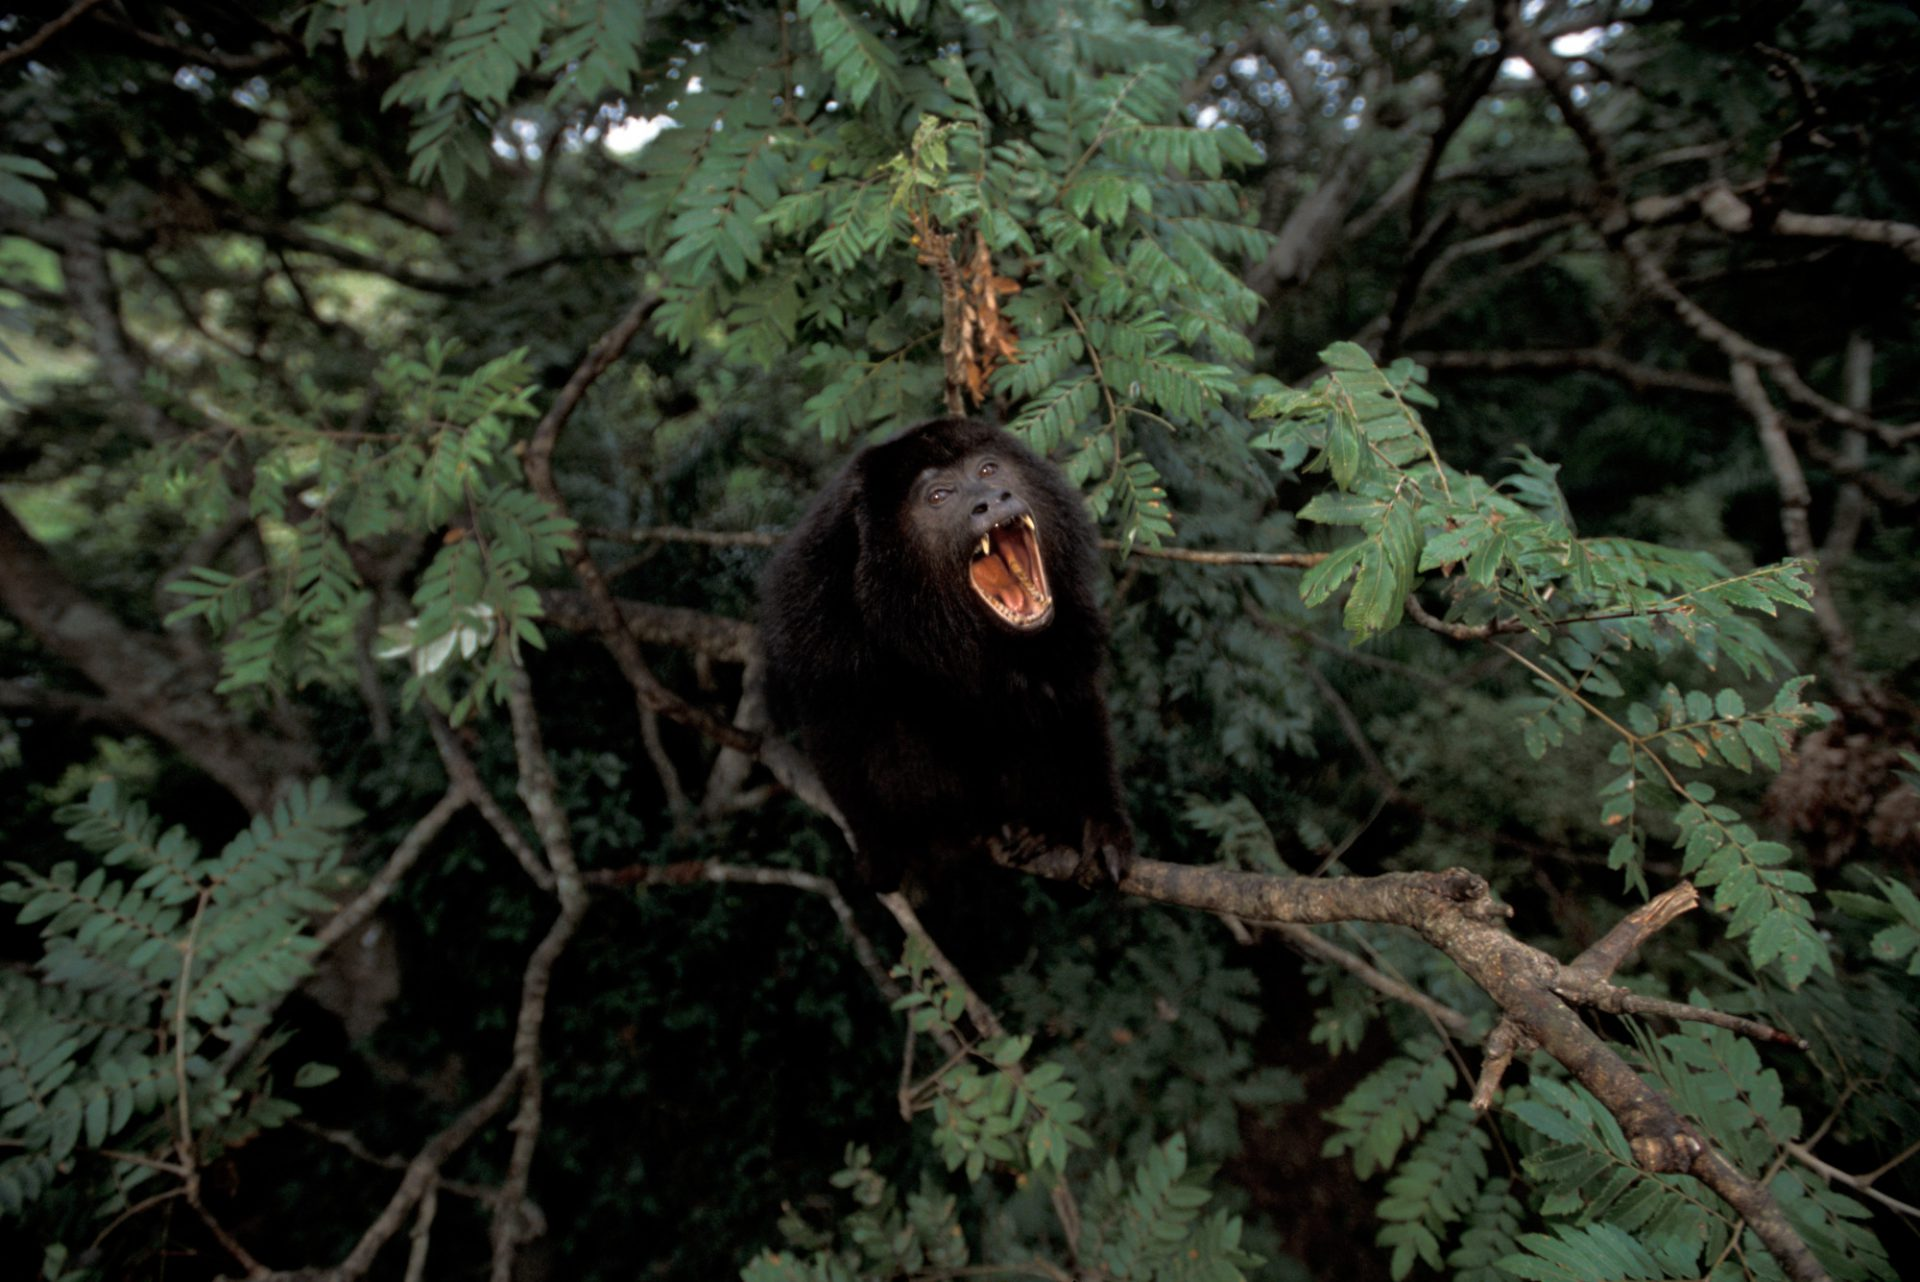 A male black howler monkey (Alouatta caraya) screams in the Pantanal, Brazil.